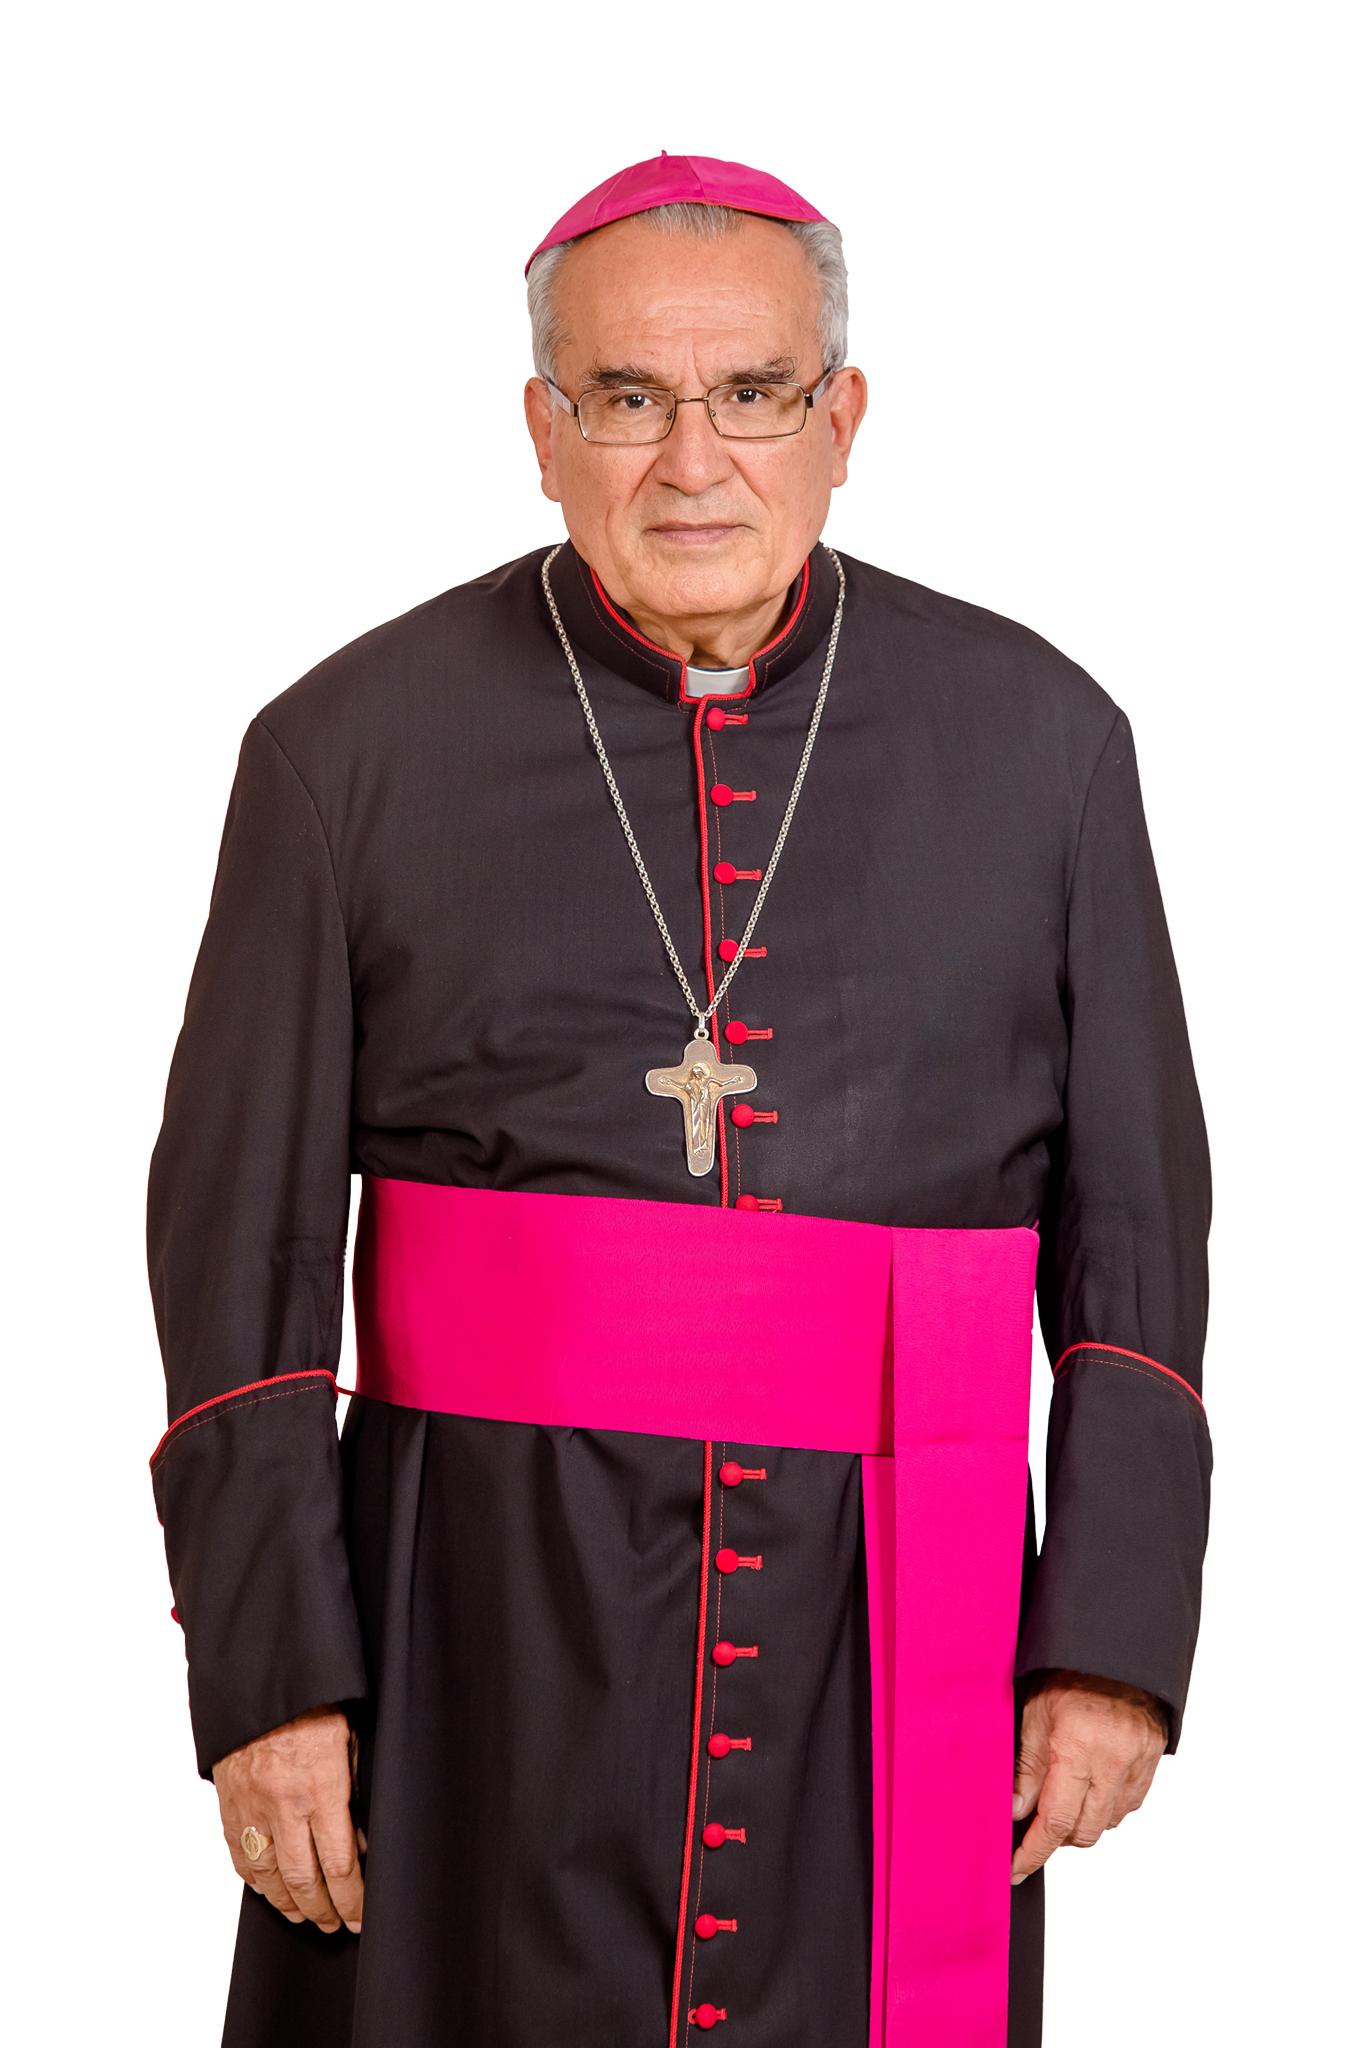 Mons. Cesar Bosco Vivas Robelo